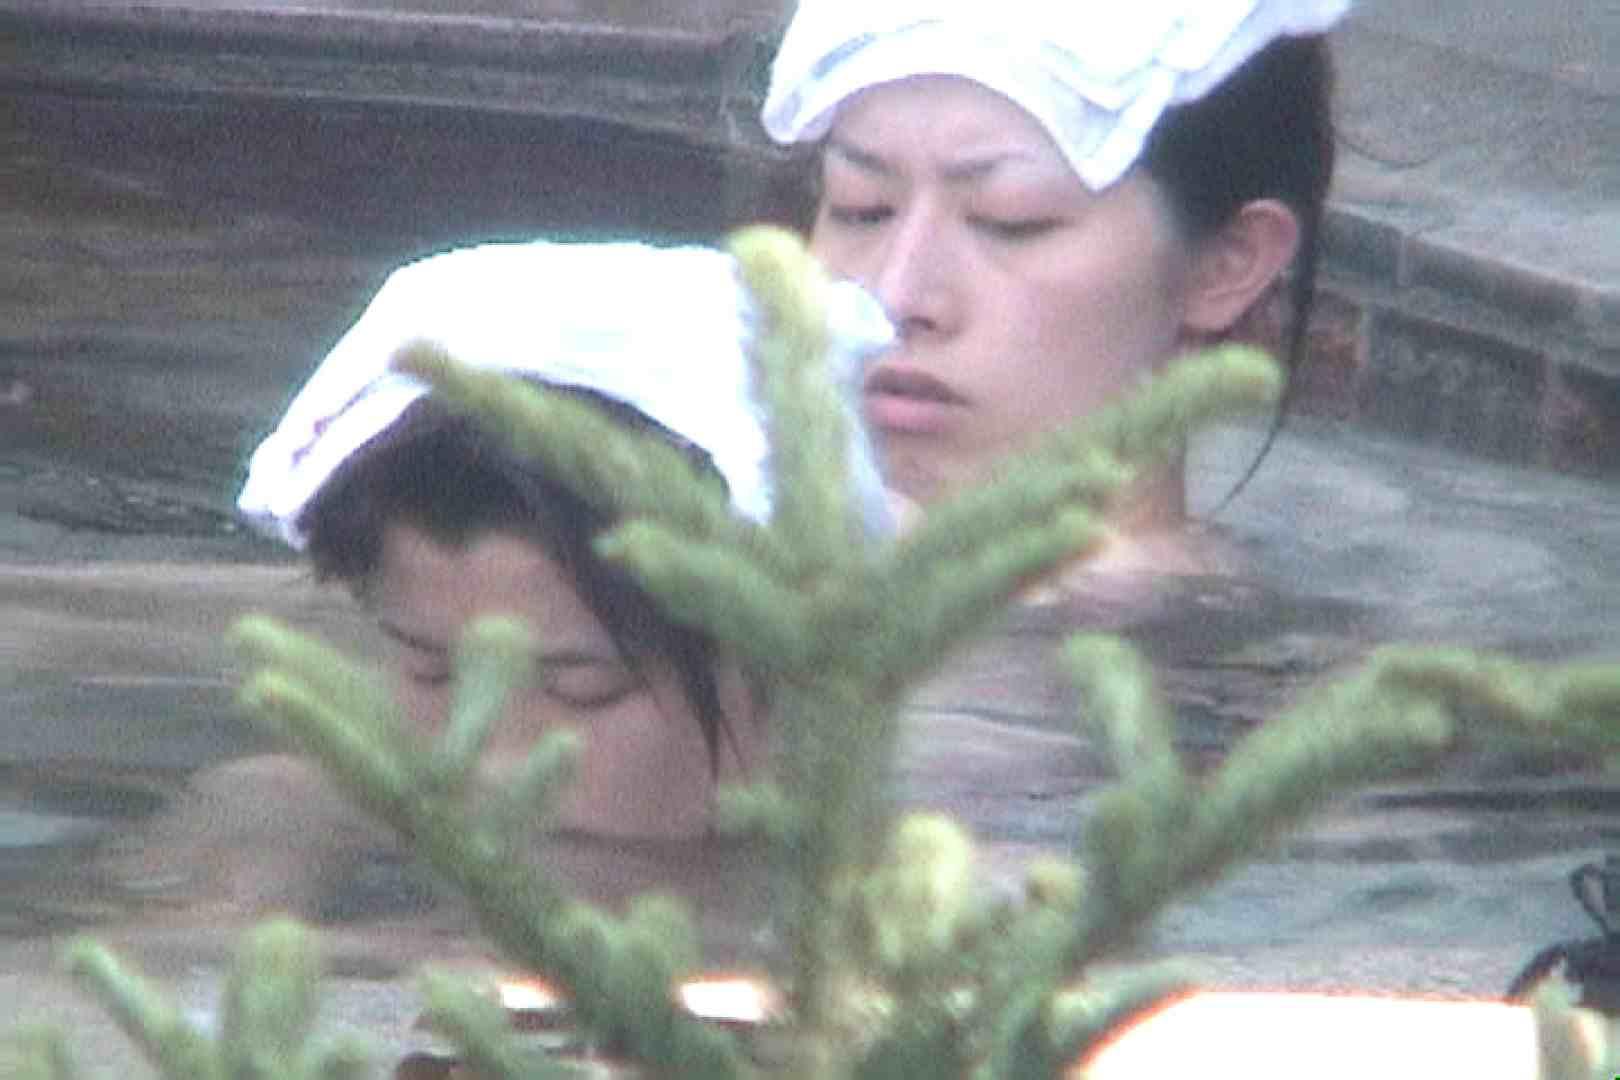 Aquaな露天風呂Vol.80【VIP限定】 盗撮 | HなOL  66pic 51